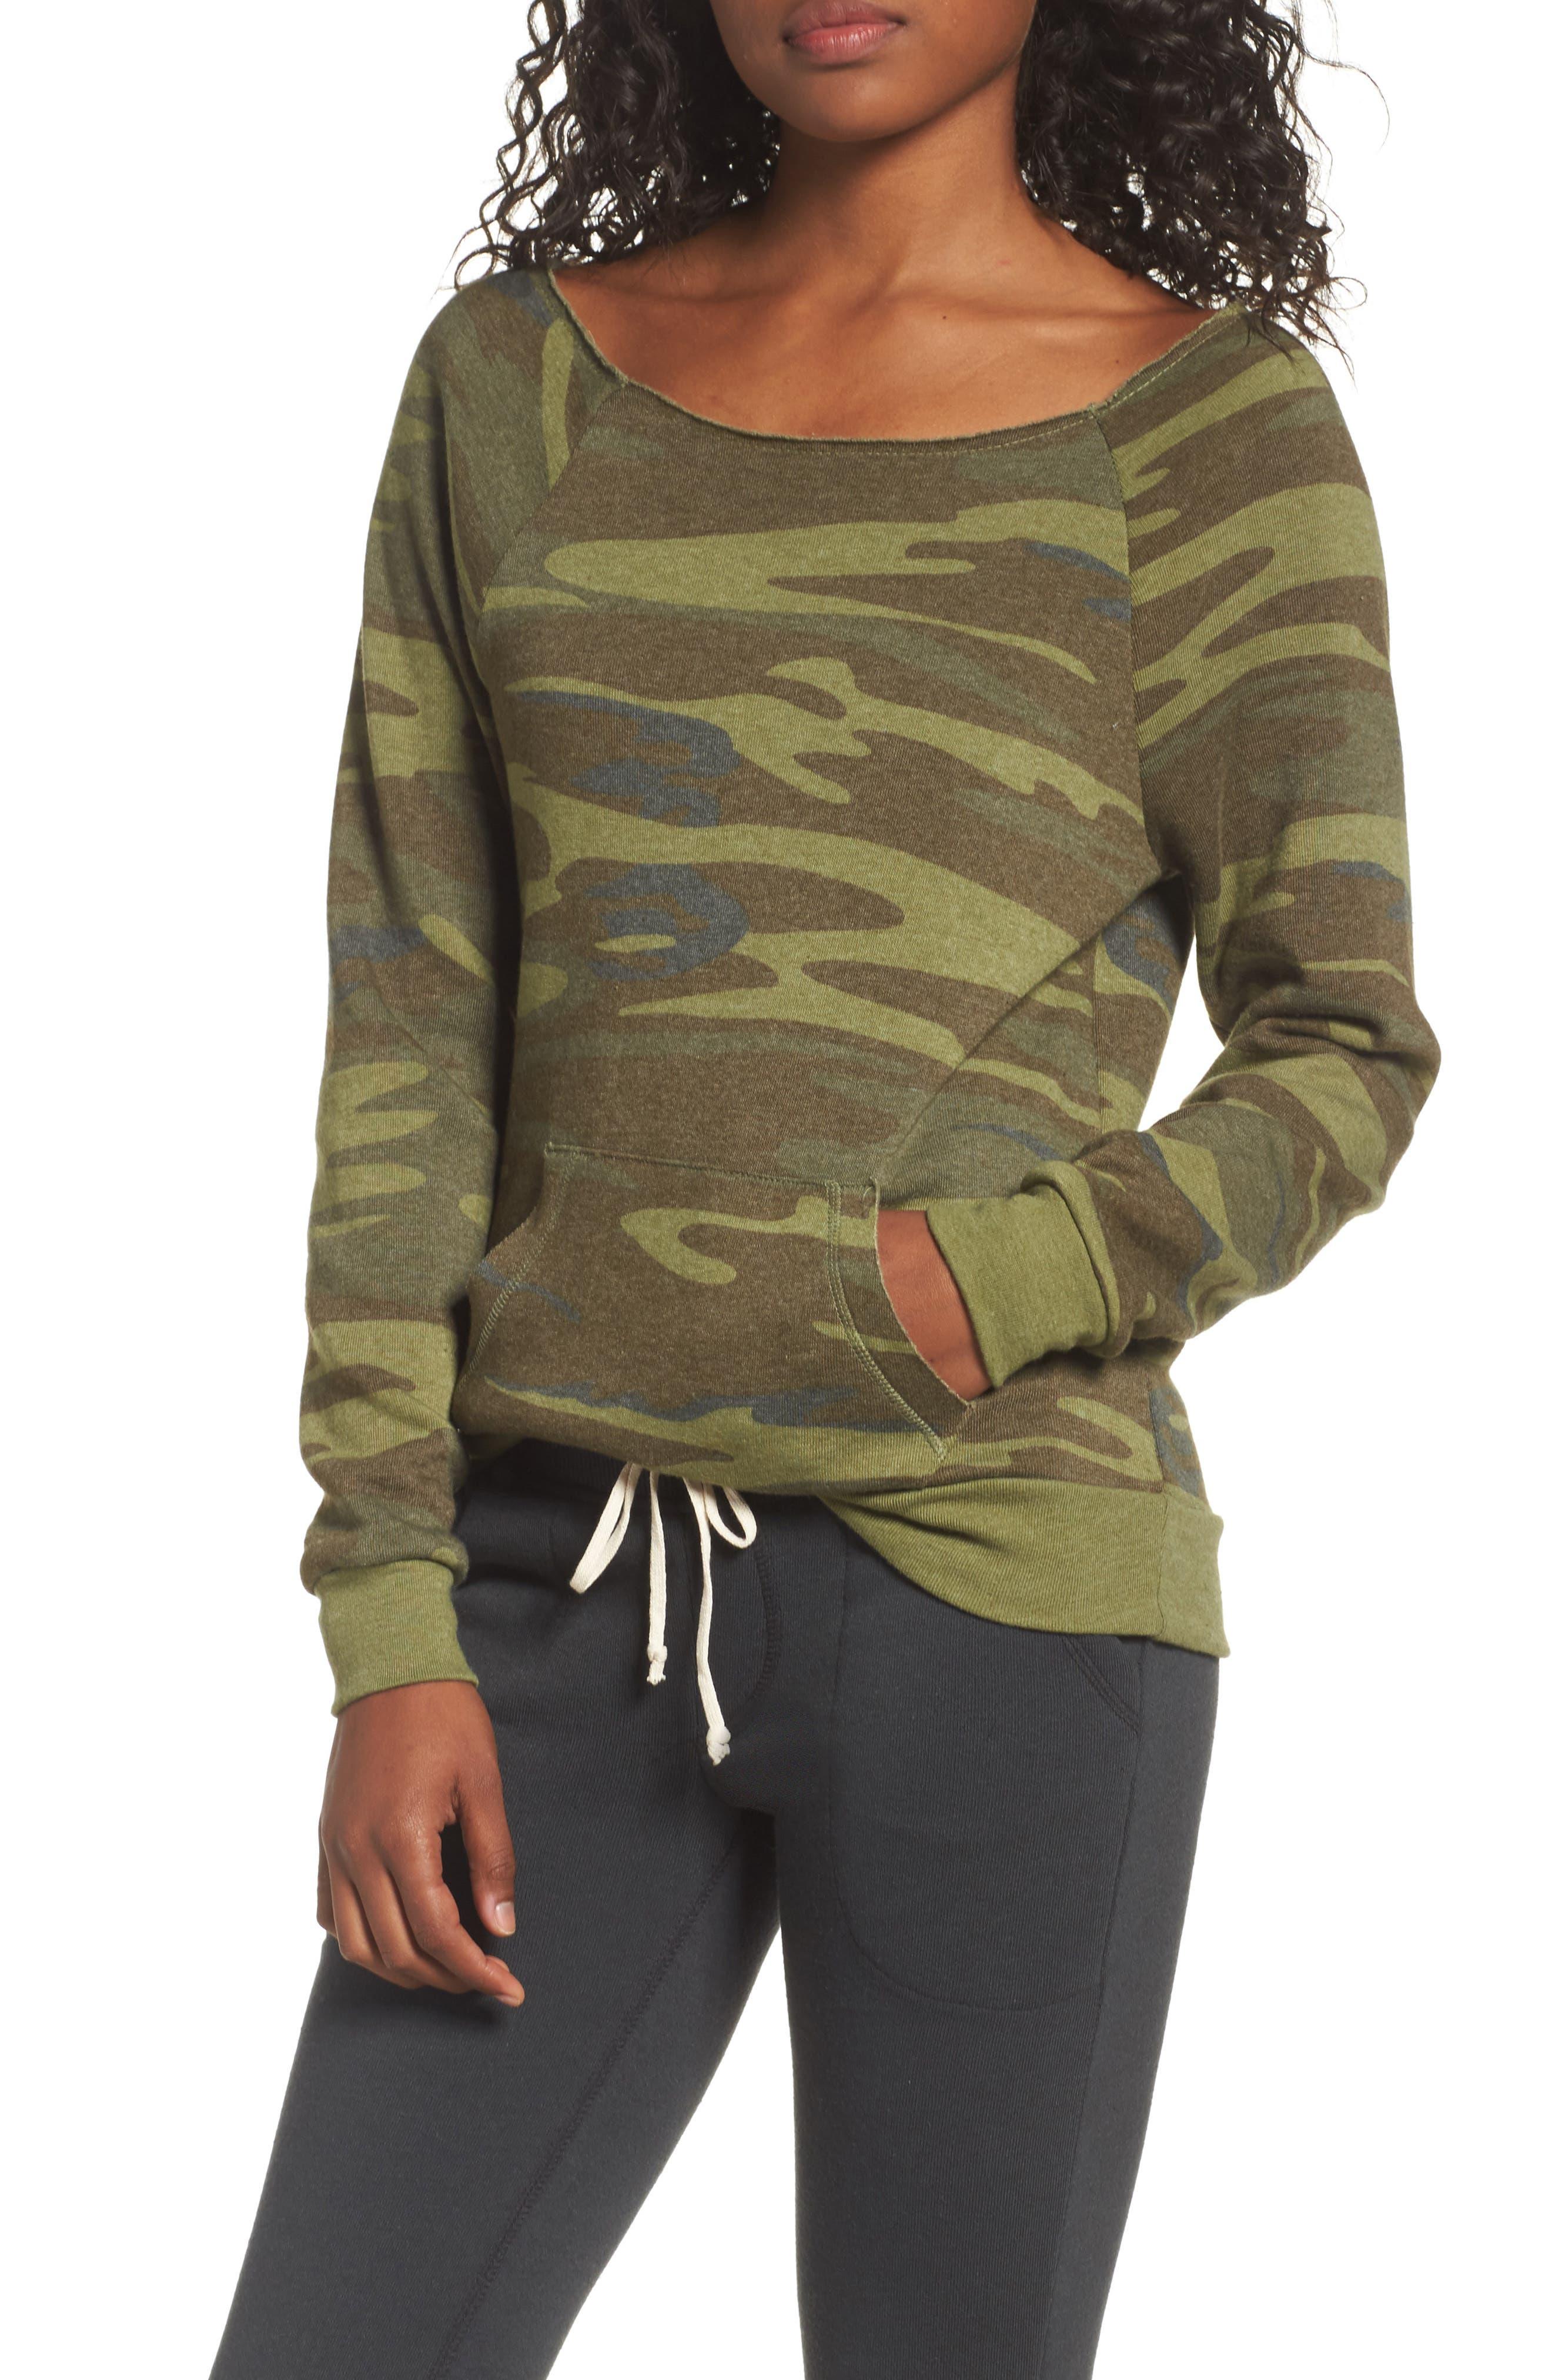 Alternate Image 1 Selected - Alternative Maniac Camo Fleece Sweatshirt